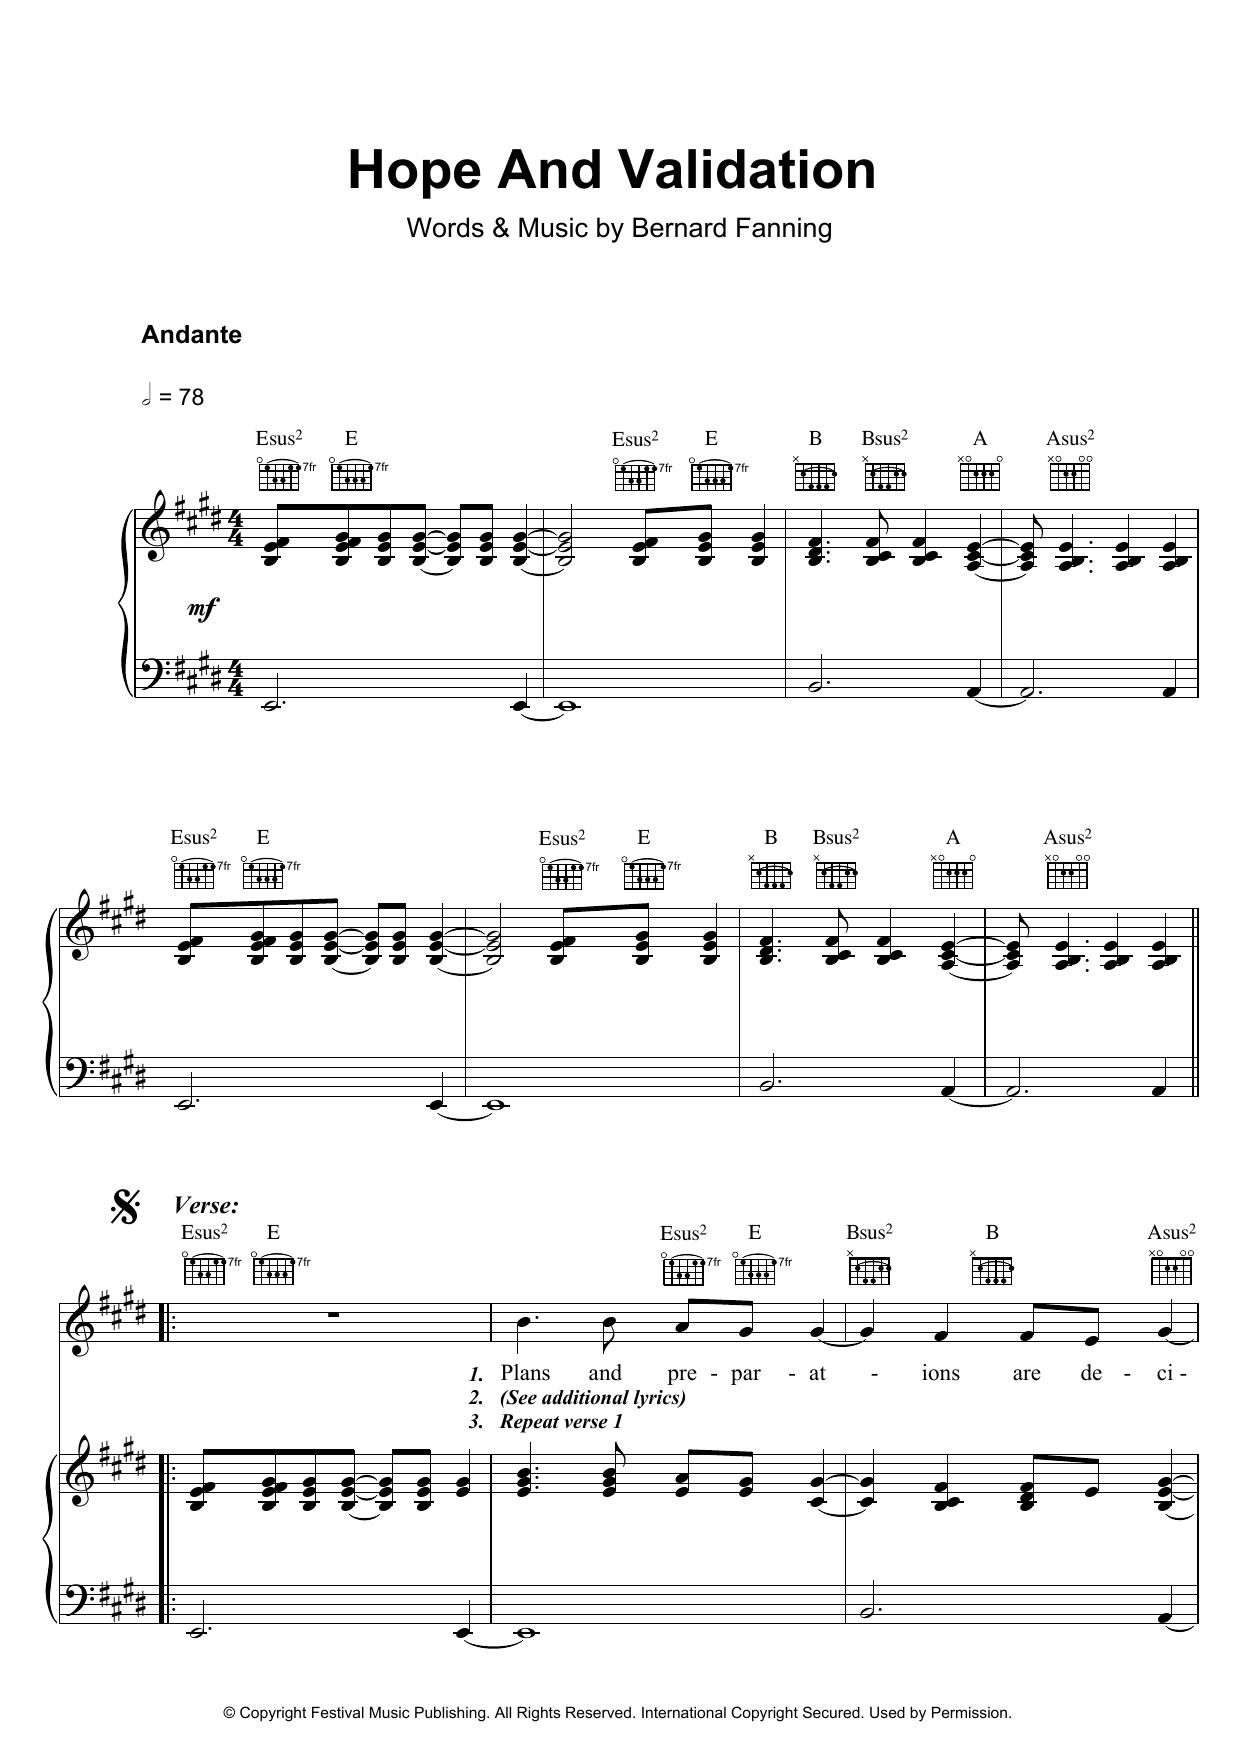 Hope And Validation Sheet Music